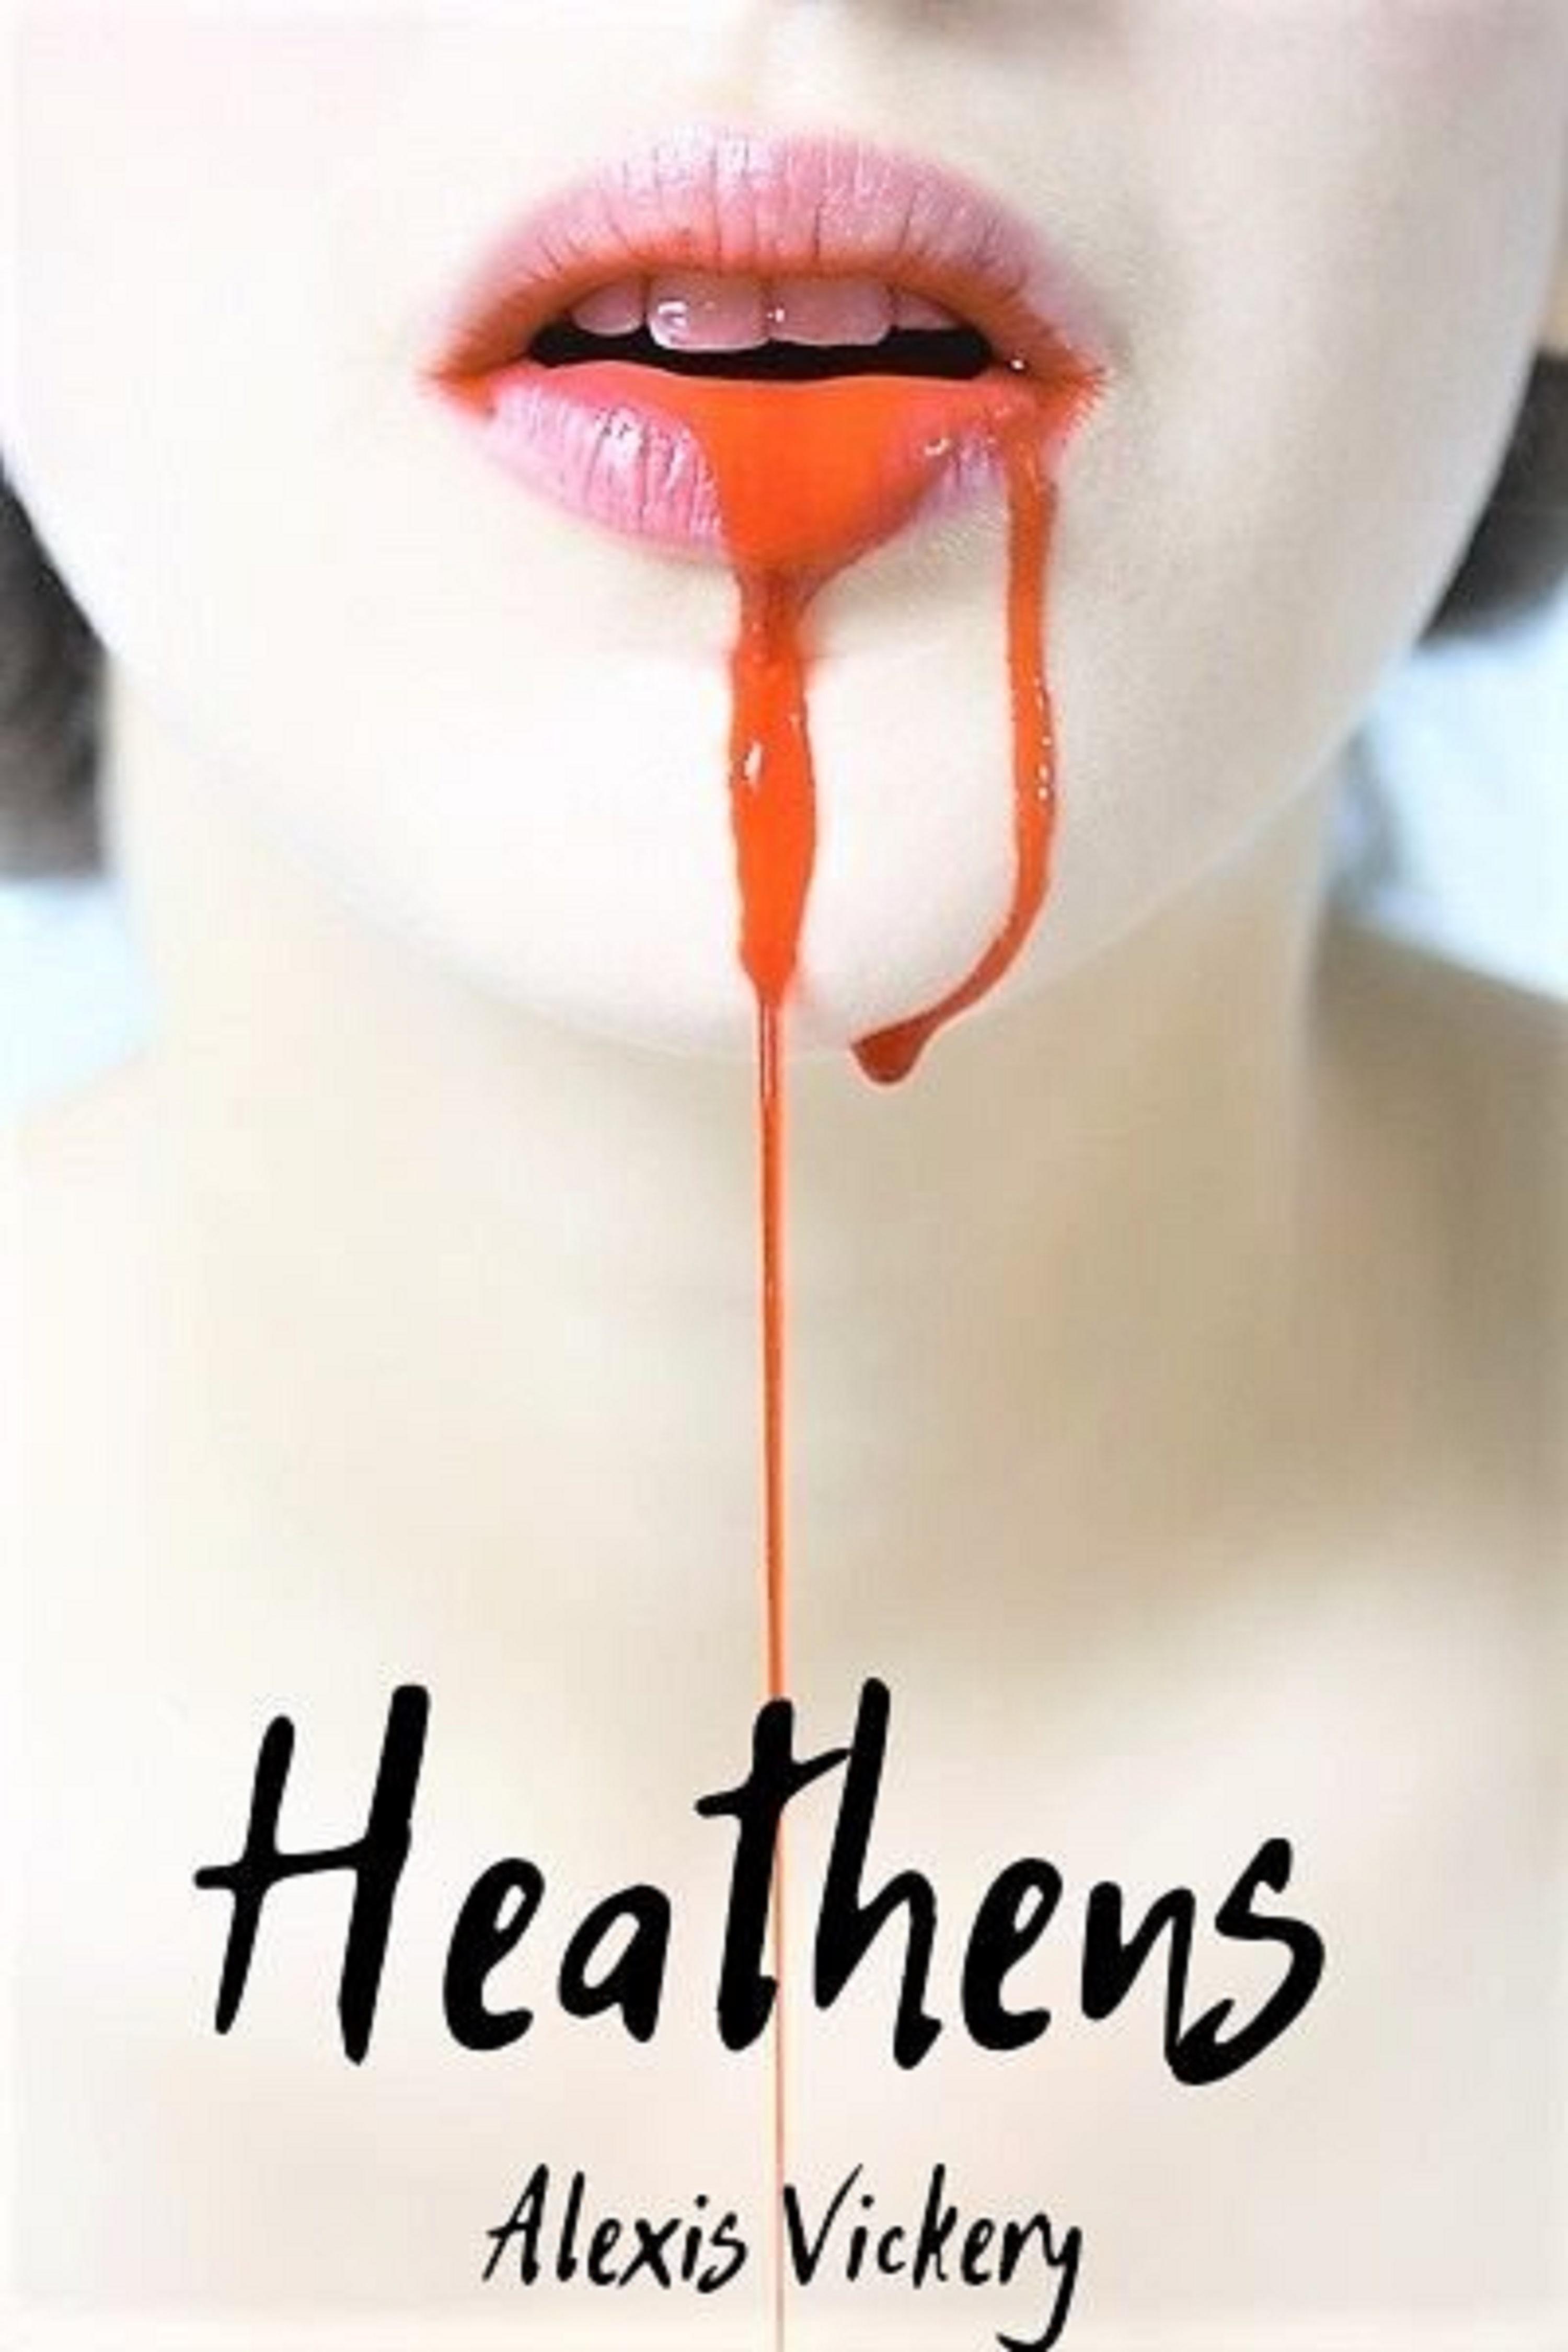 Heathens by Alexis Vickery